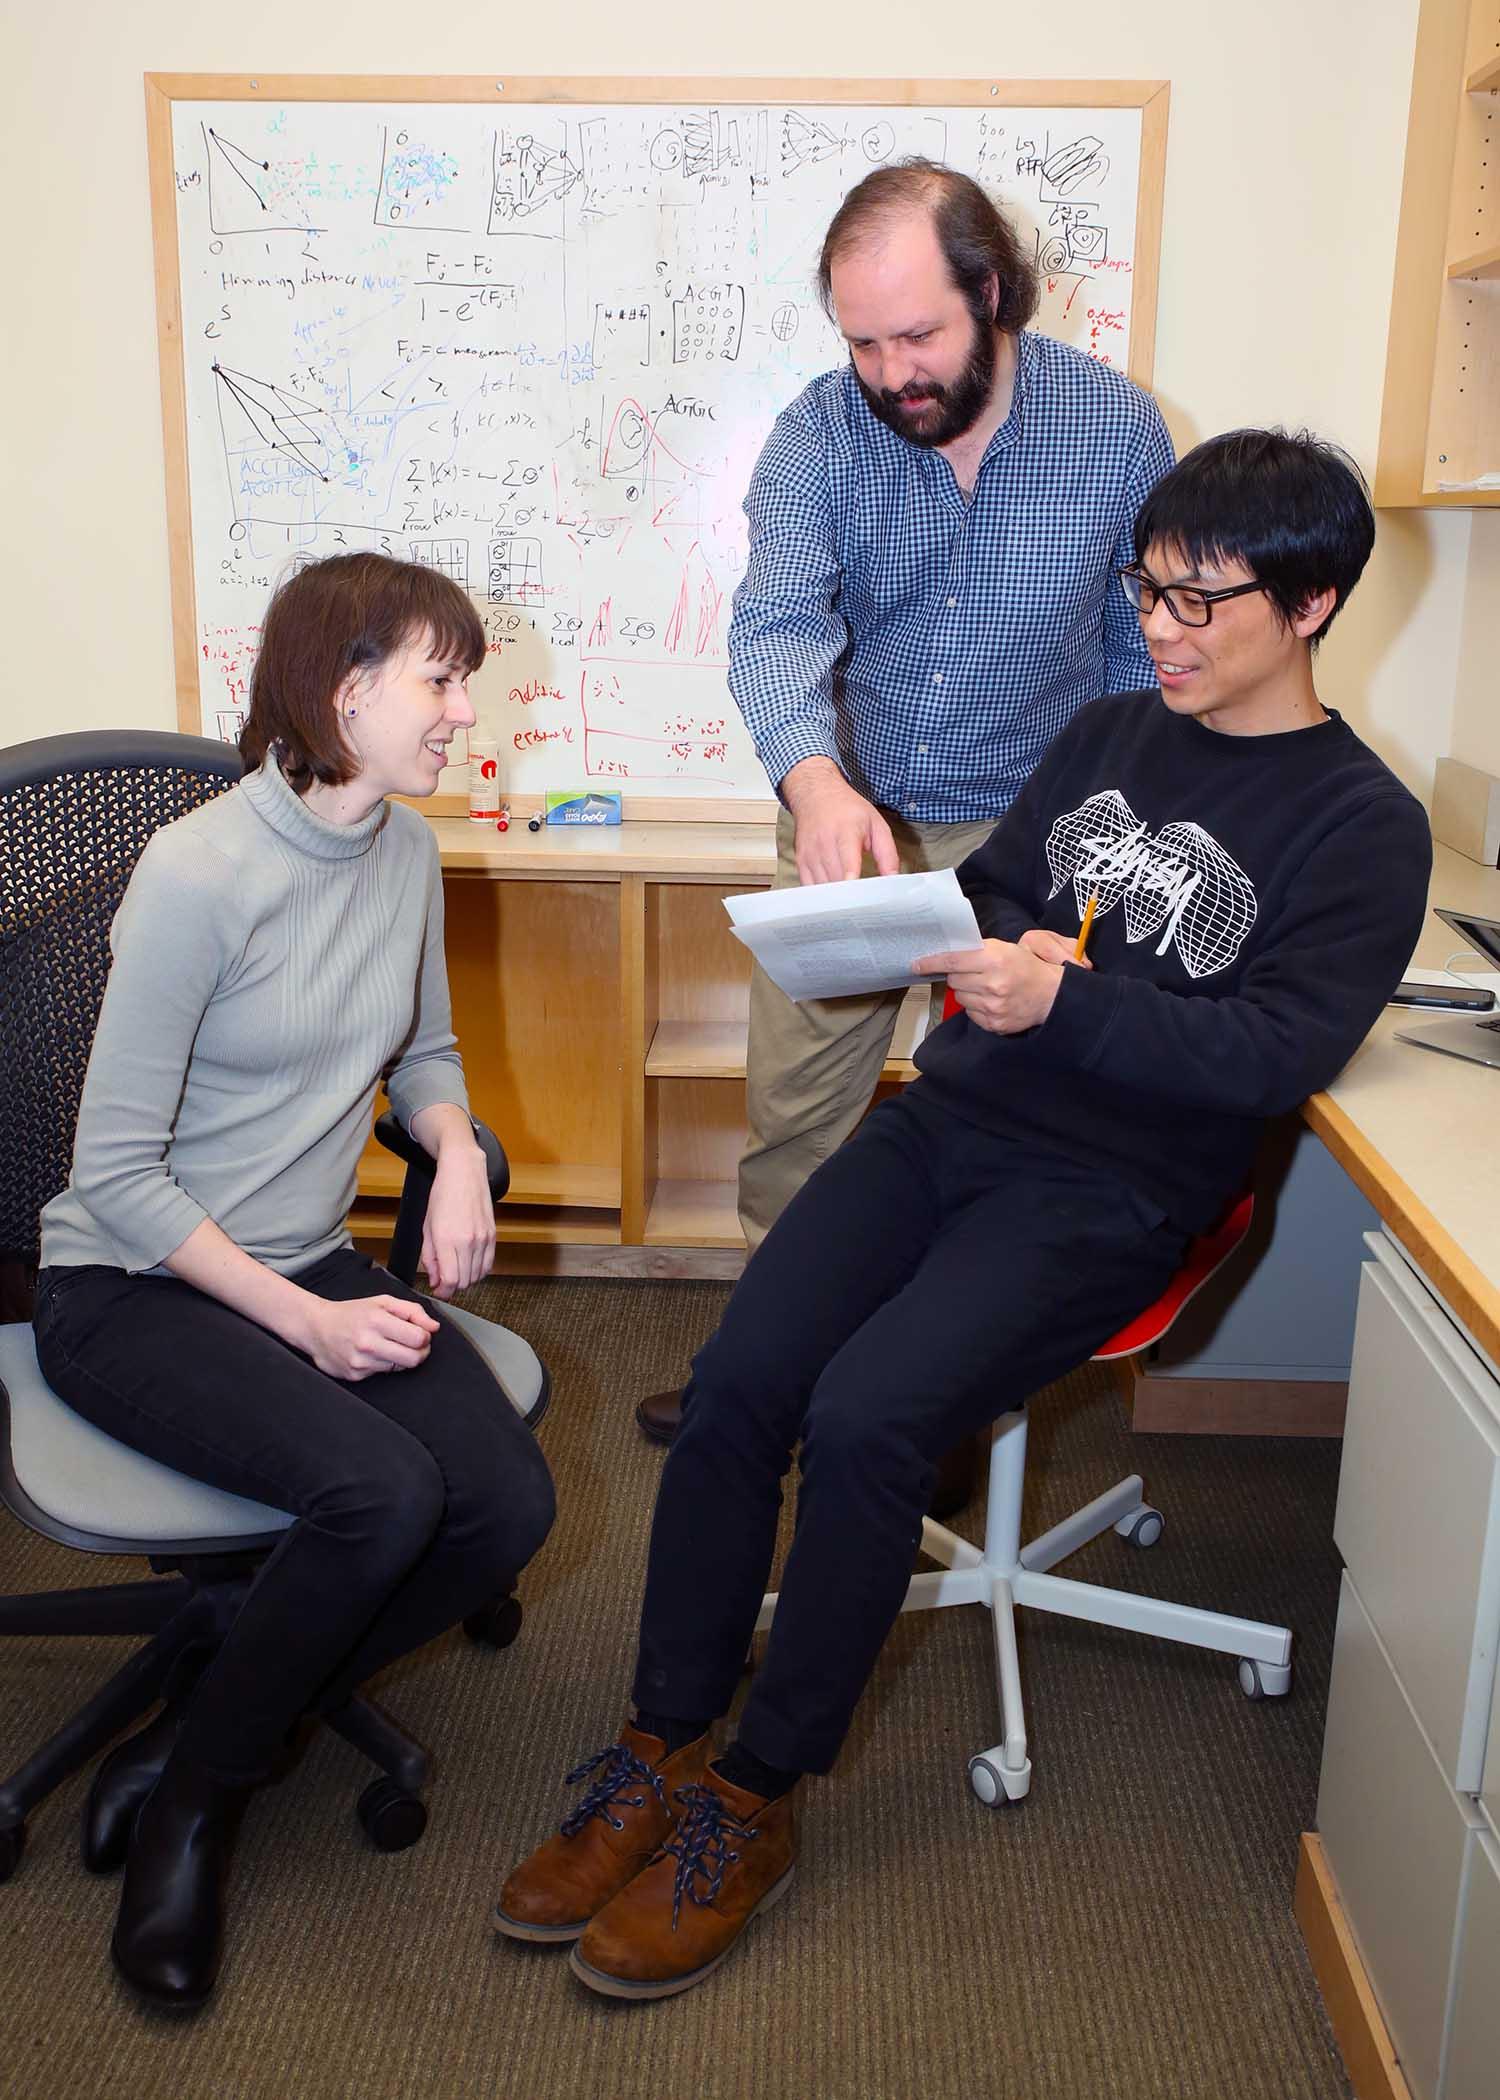 photo of David McCandlish Anna Posfai and Juannan Zhou in the lab